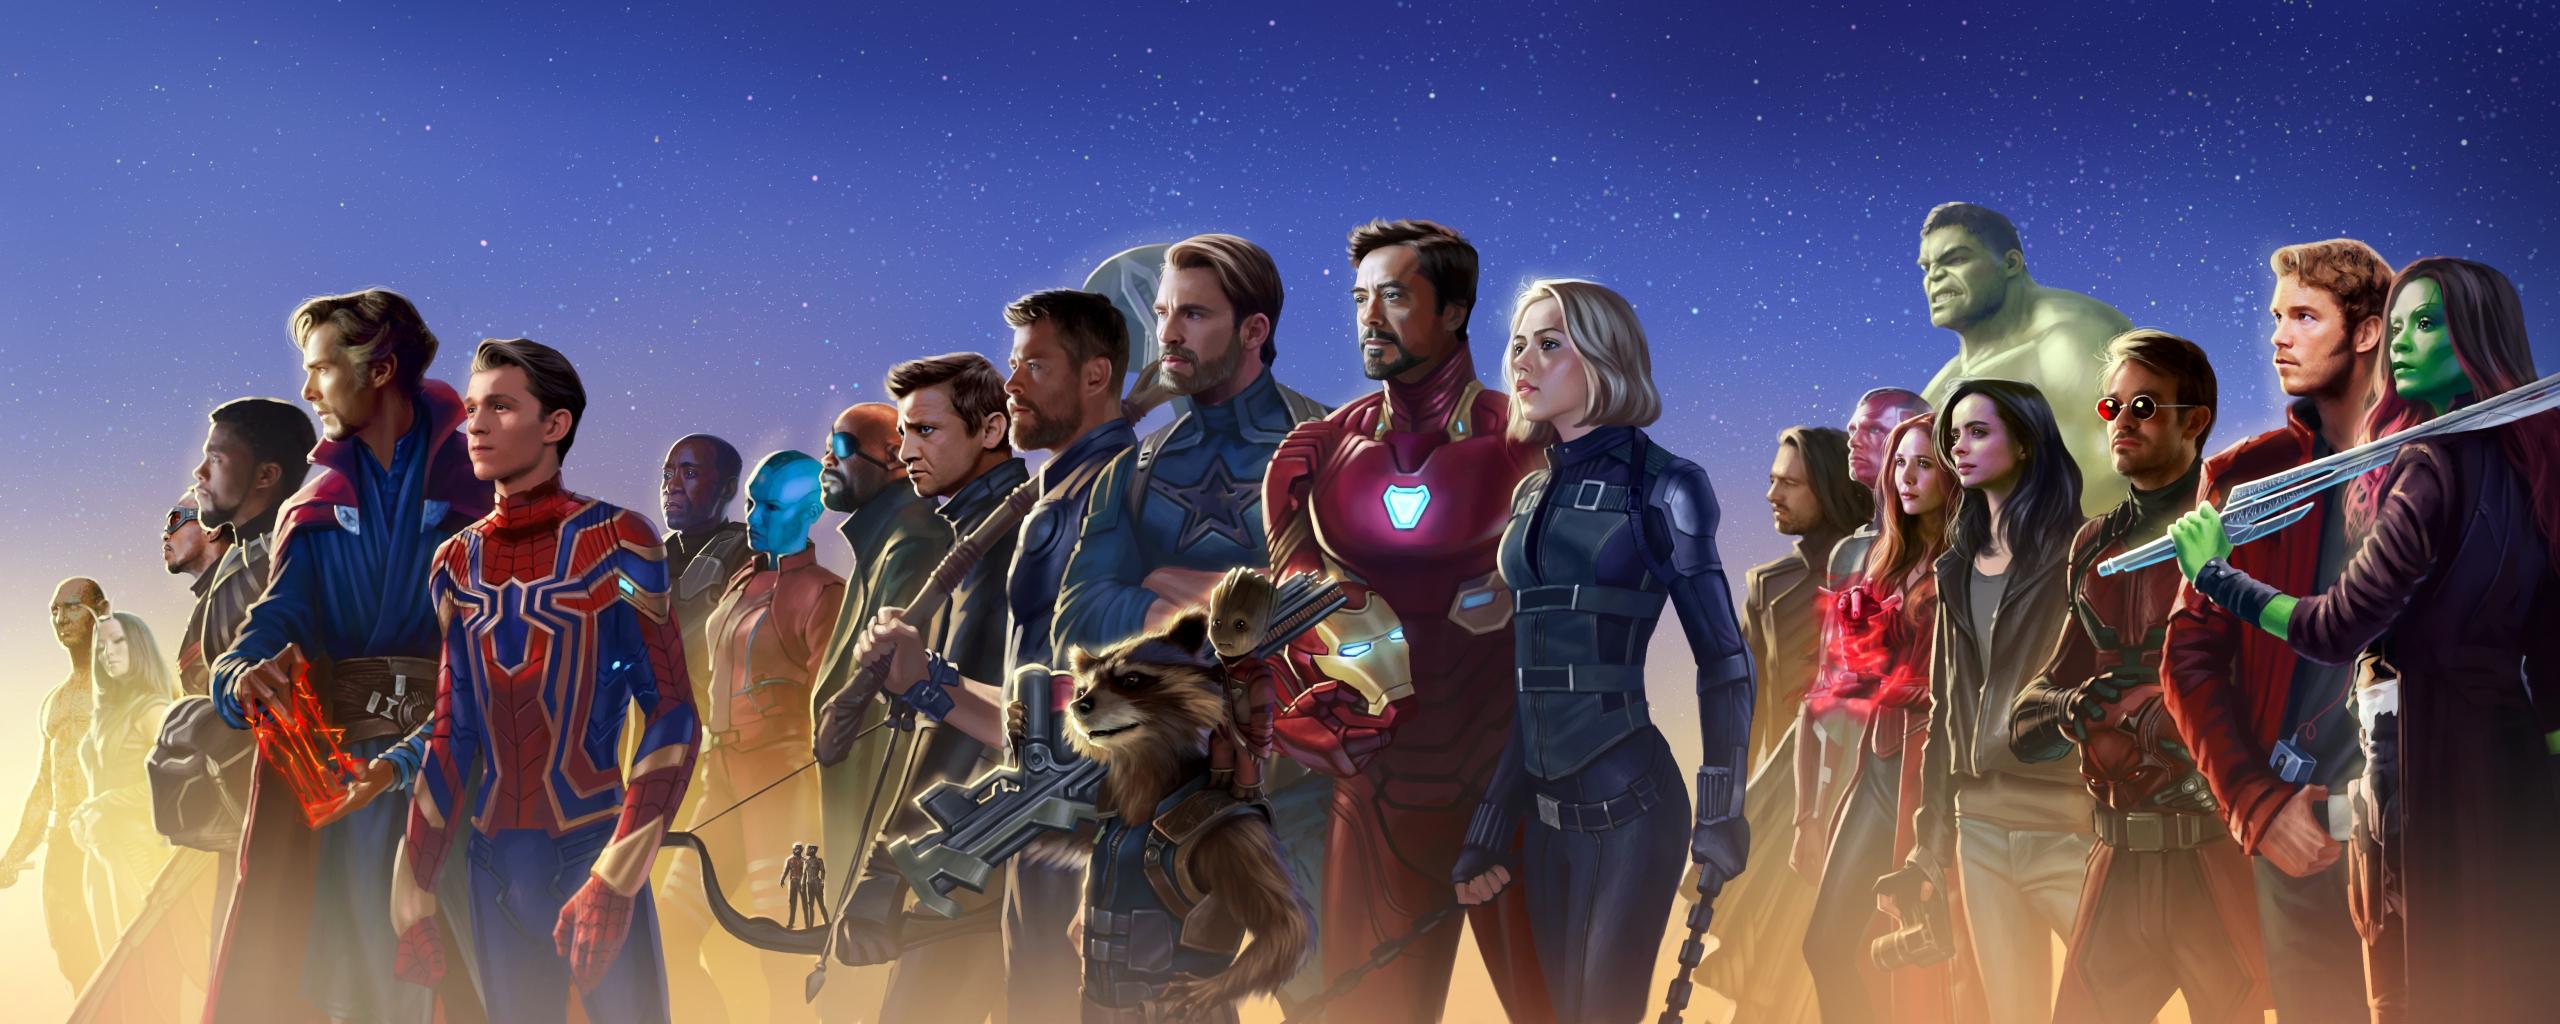 Download 2560x1024 Wallpaper Superheros Marvel Artwork